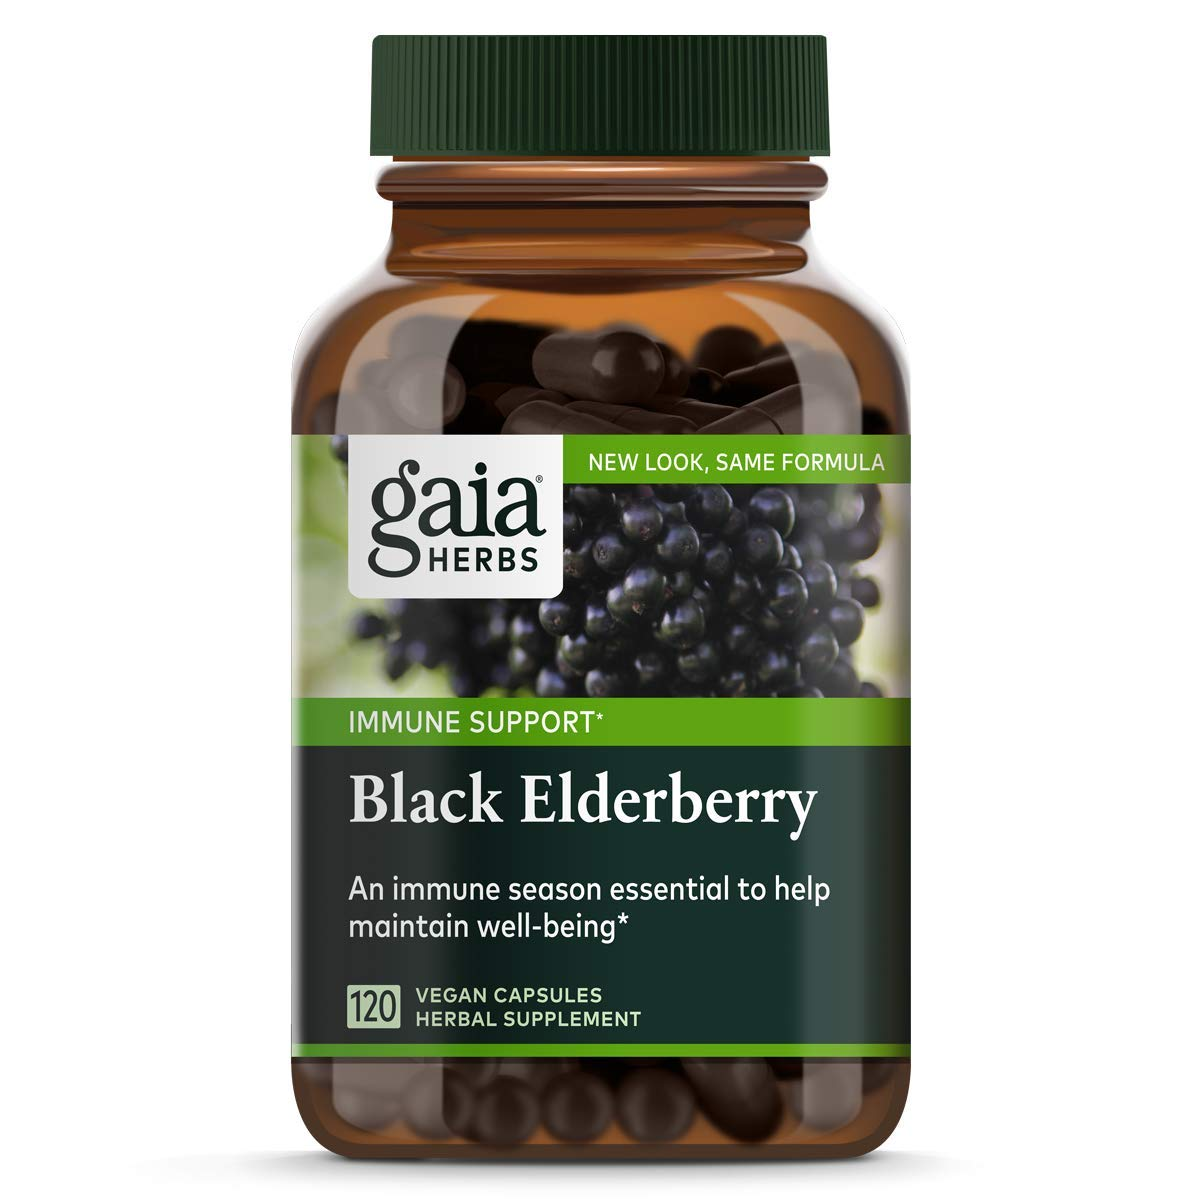 Gaia Herbs, Black Elderberry, Organic Sambucus Elderberry Extract for Daily Immune and Antioxidant Support, Vegan Powder Capsules, 120 Count (Pack of 1)